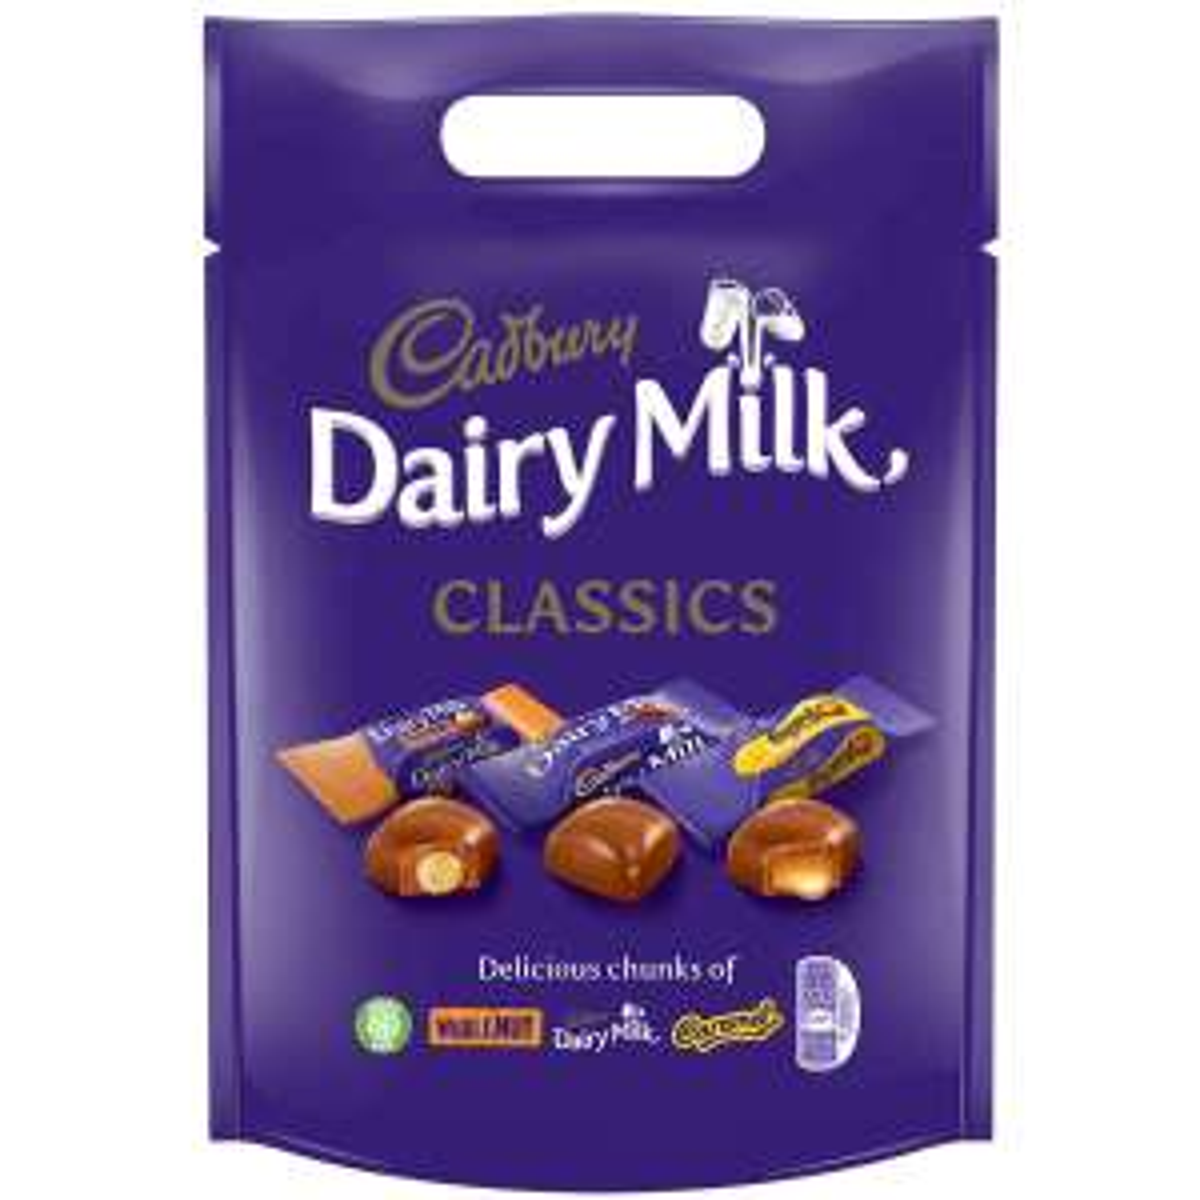 Cadbury Dairy Milk Classic Collection Chocolate Bag - £3 @ Asda